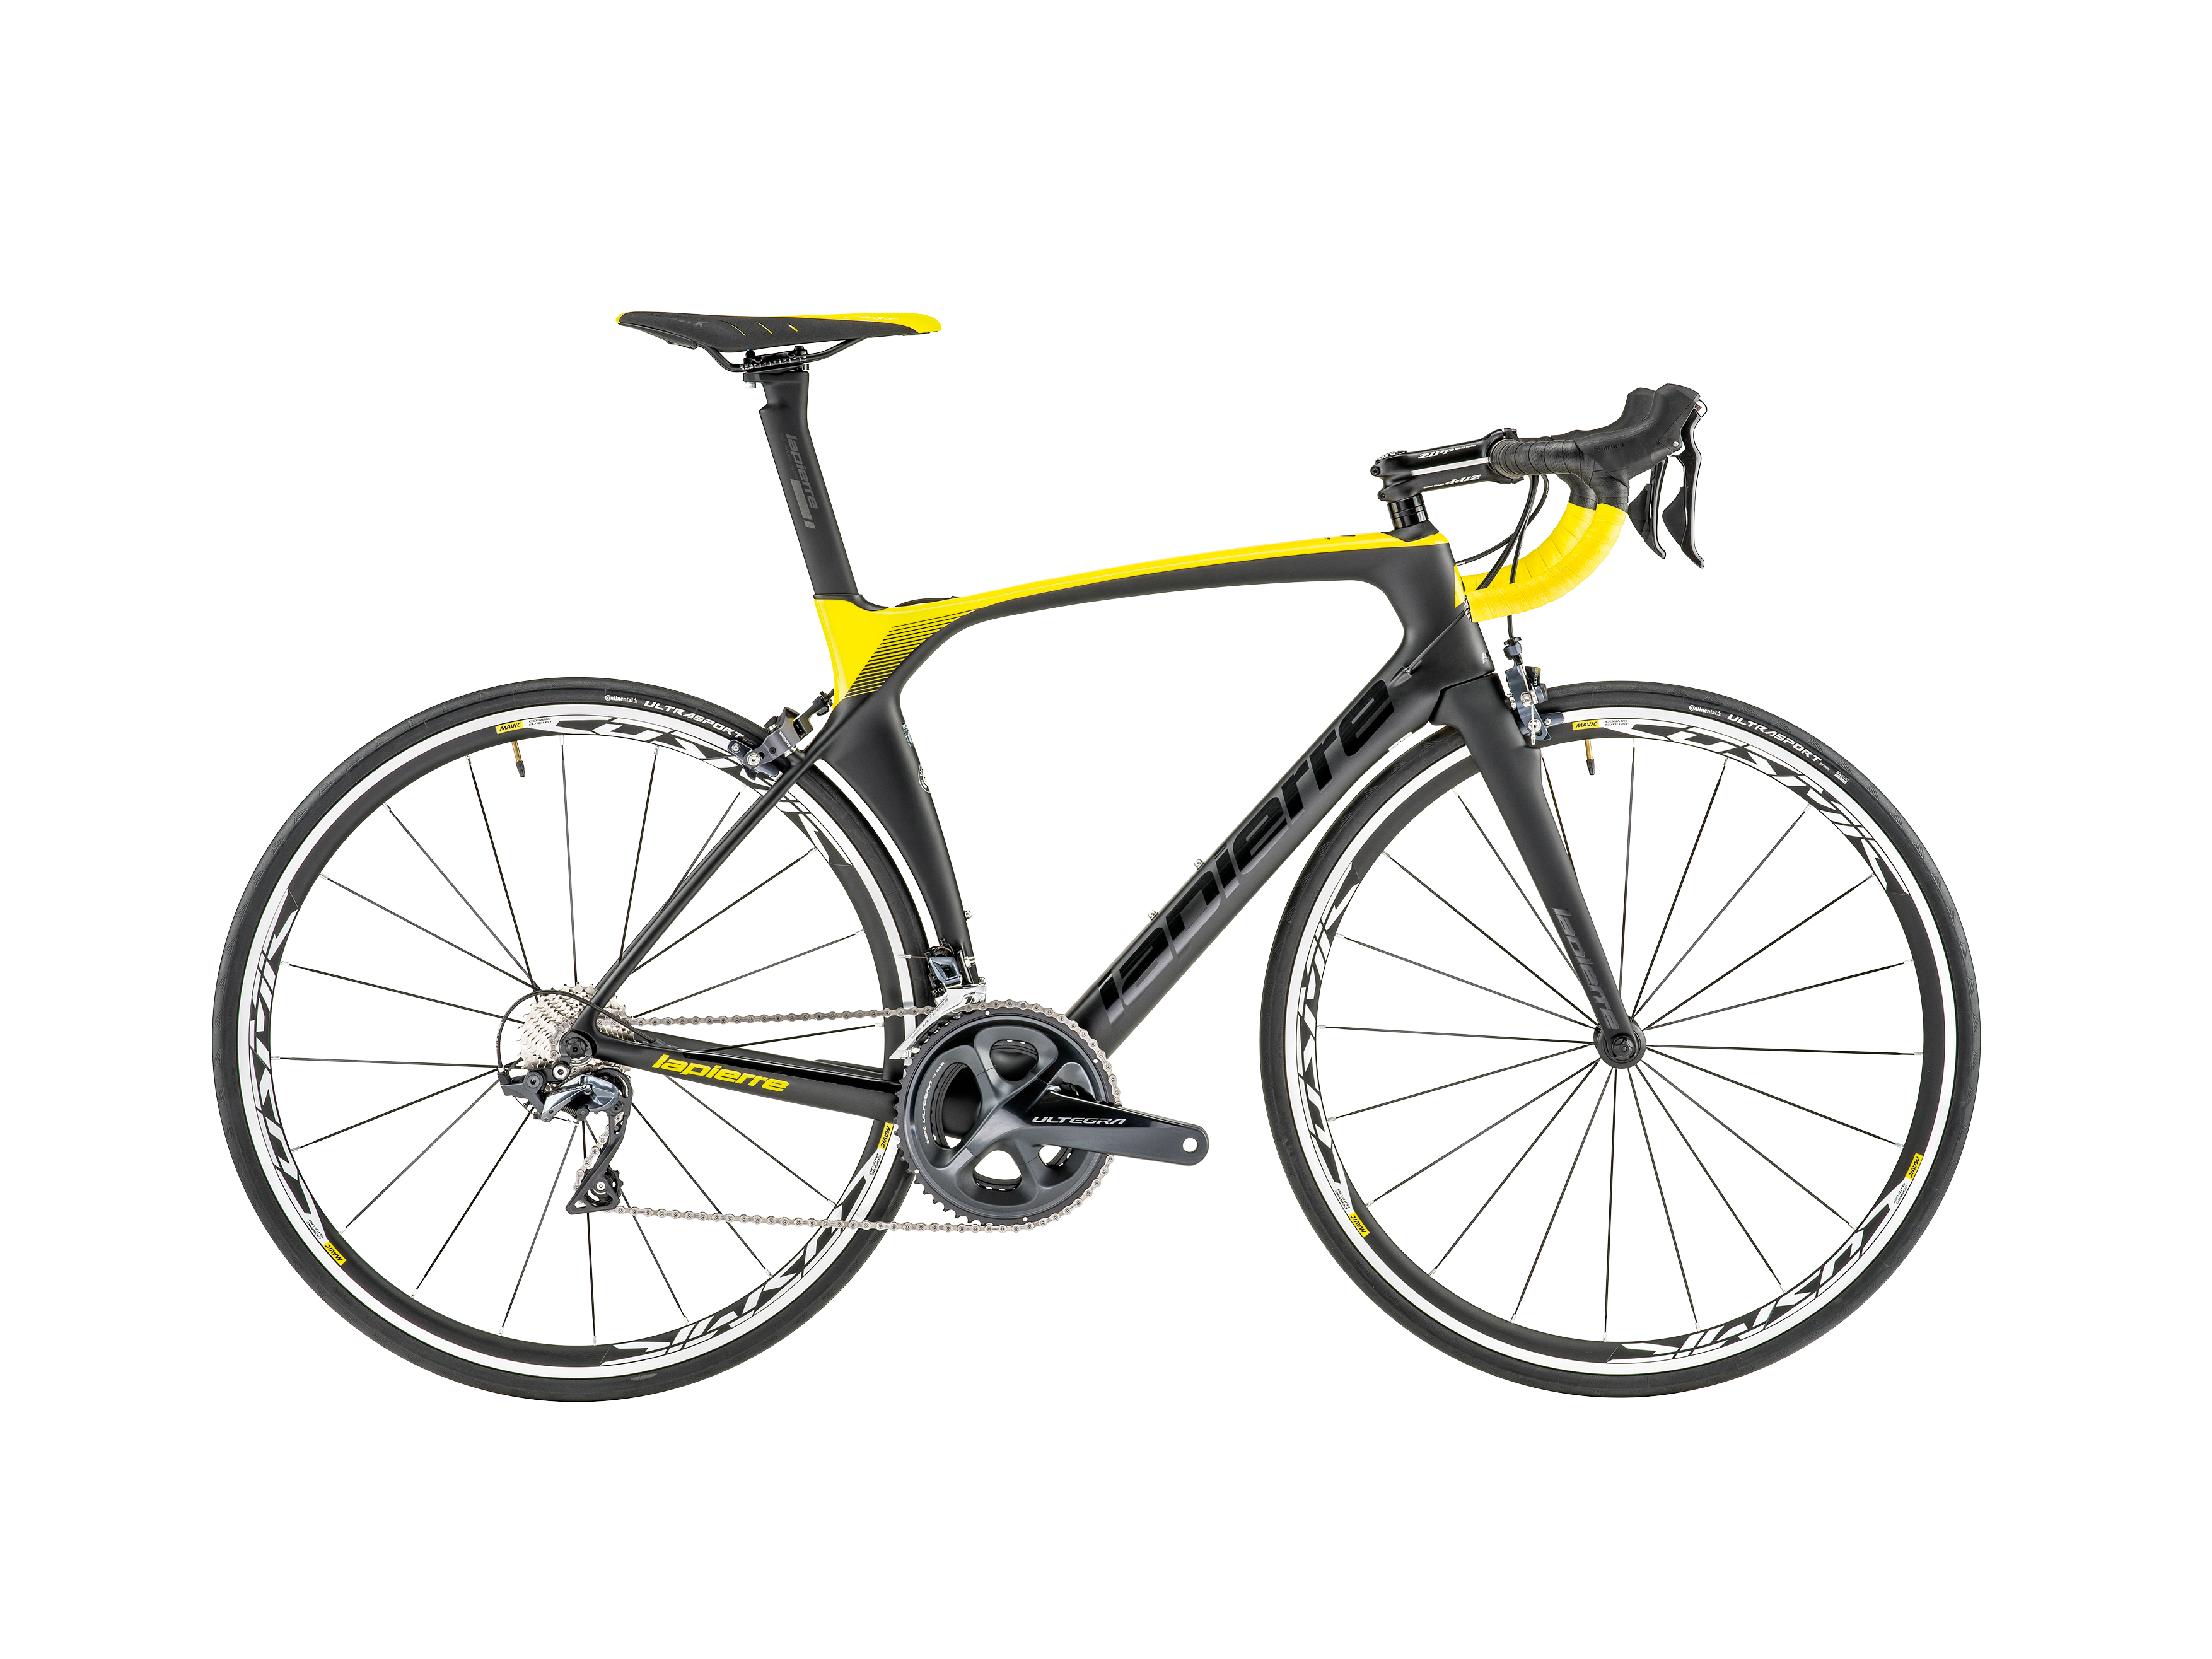 Bicykel LAPIERRE AIRCODE SL 600 2019